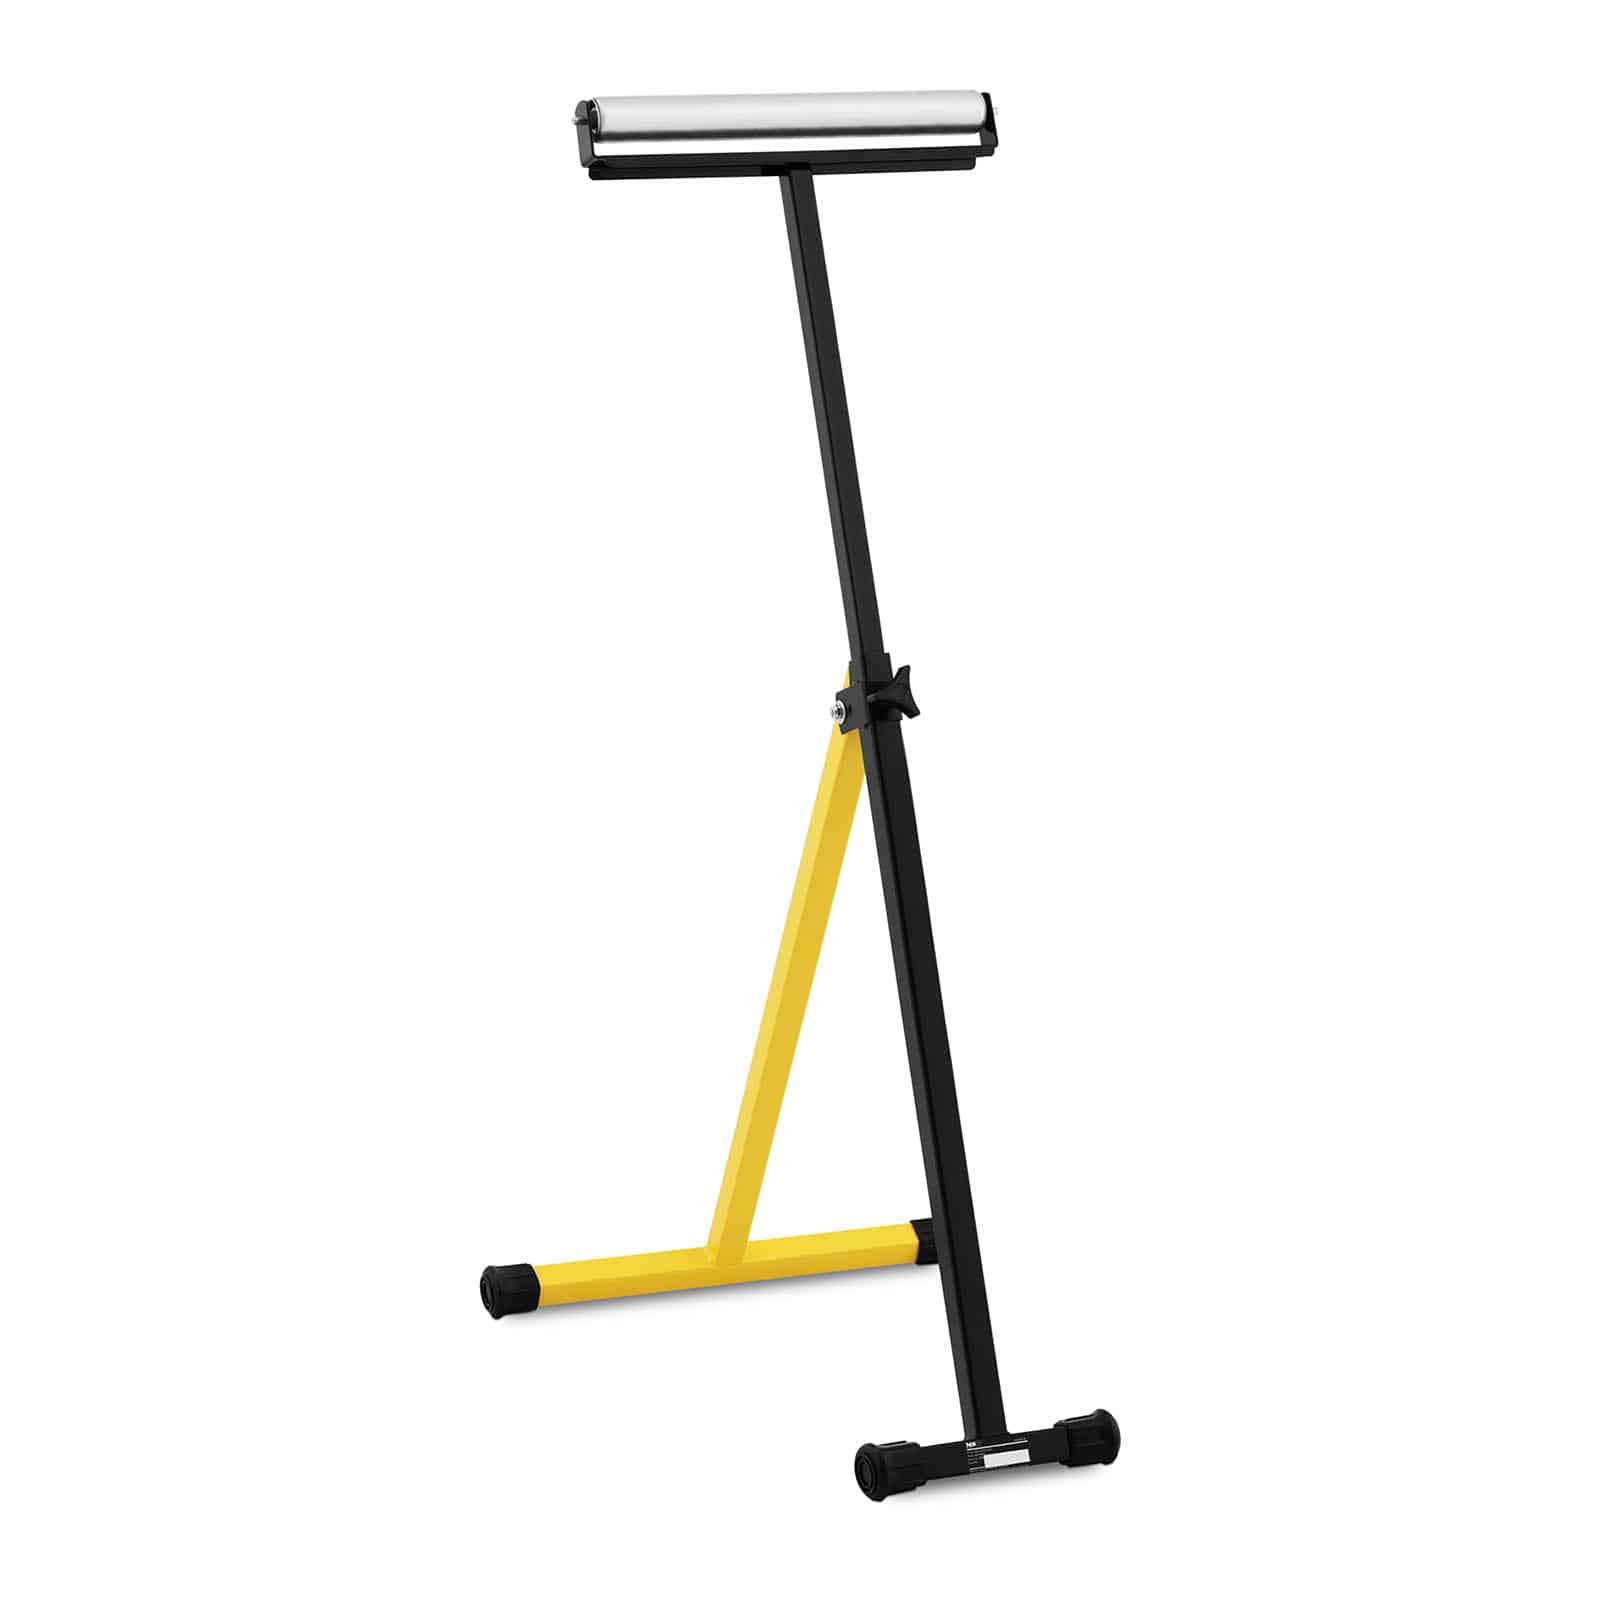 Roller Stands